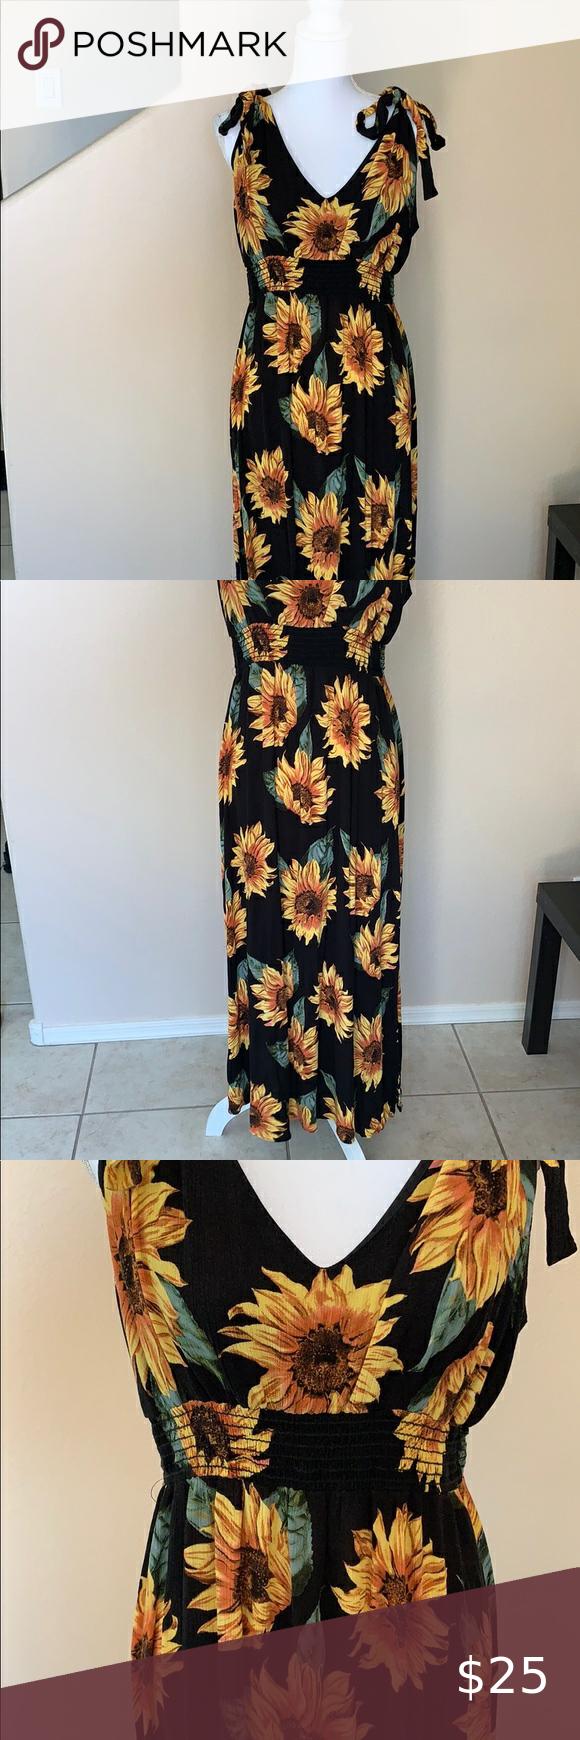 F21 Plus Sunflower Maxi Dress Maxi Dress Elegant Dresses Clothes Design [ 1740 x 580 Pixel ]